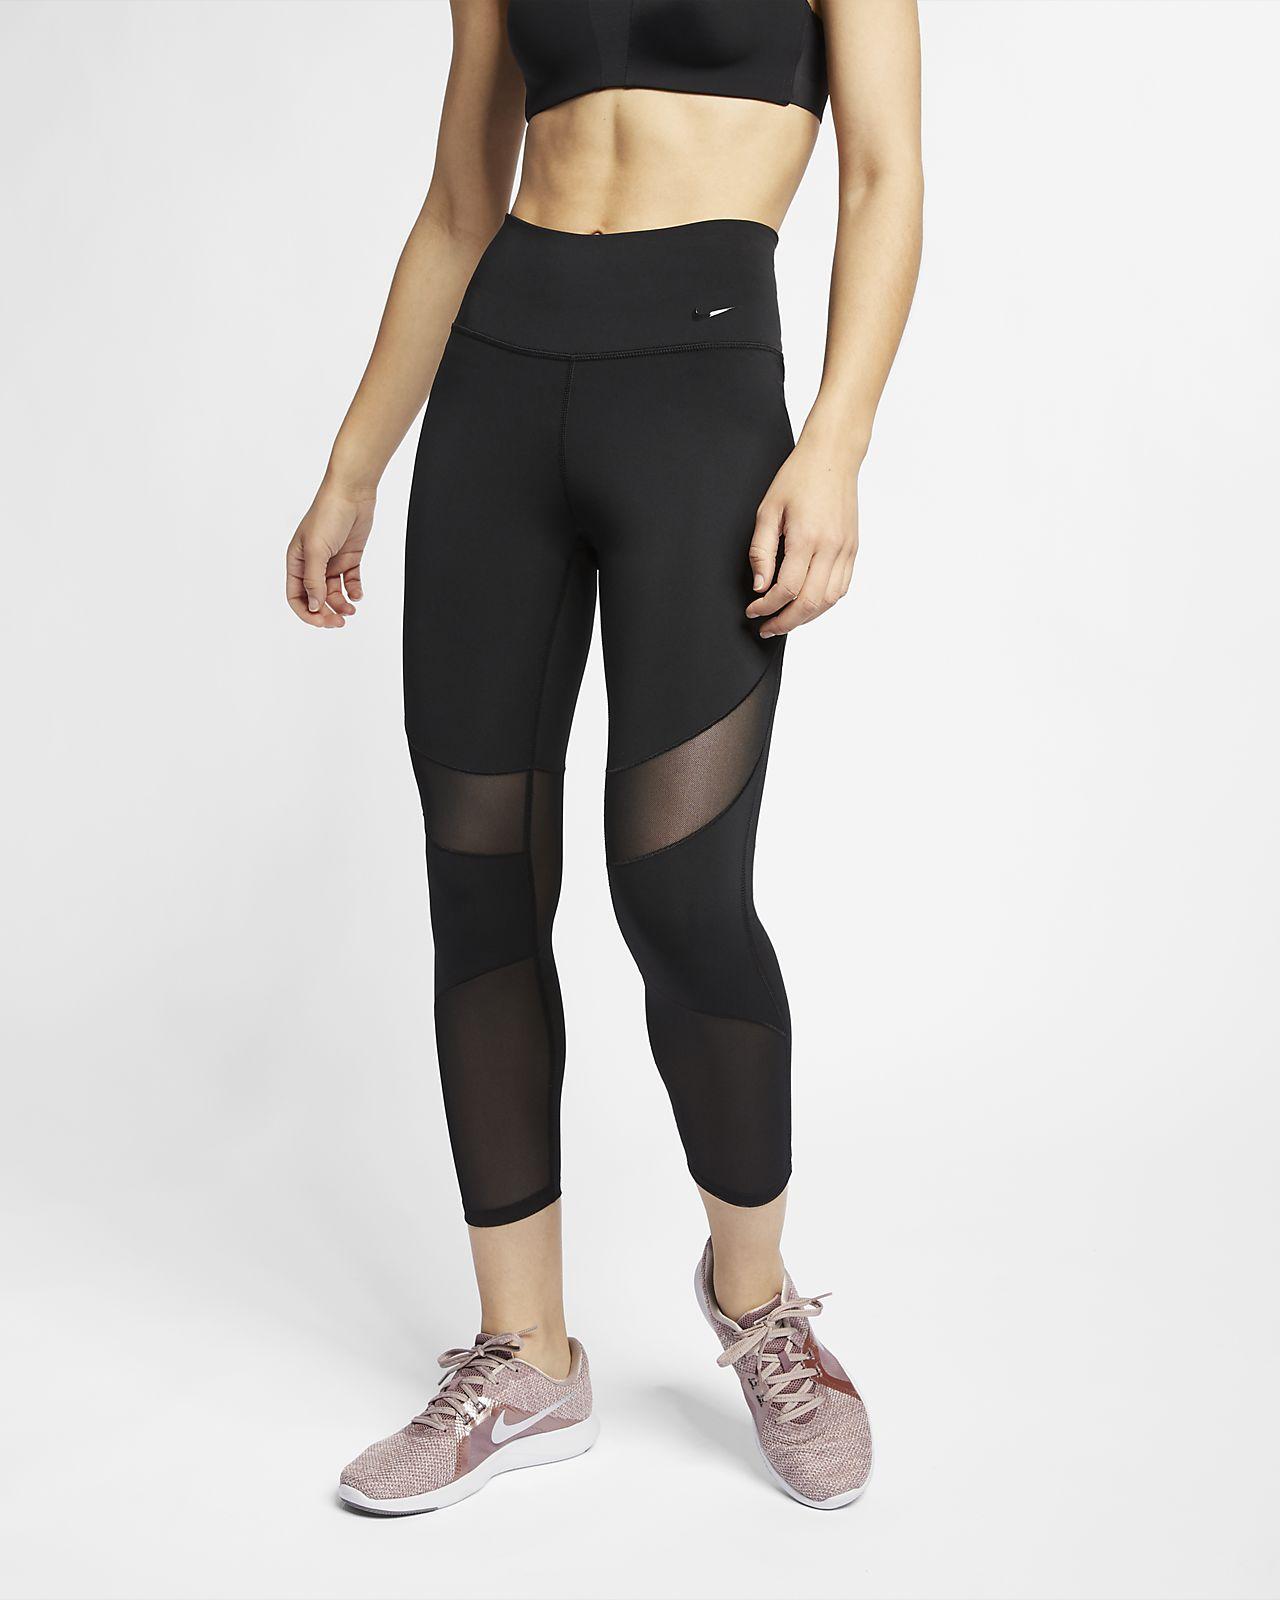 Leggings a lunghezza ridotta Nike Fly - Donna